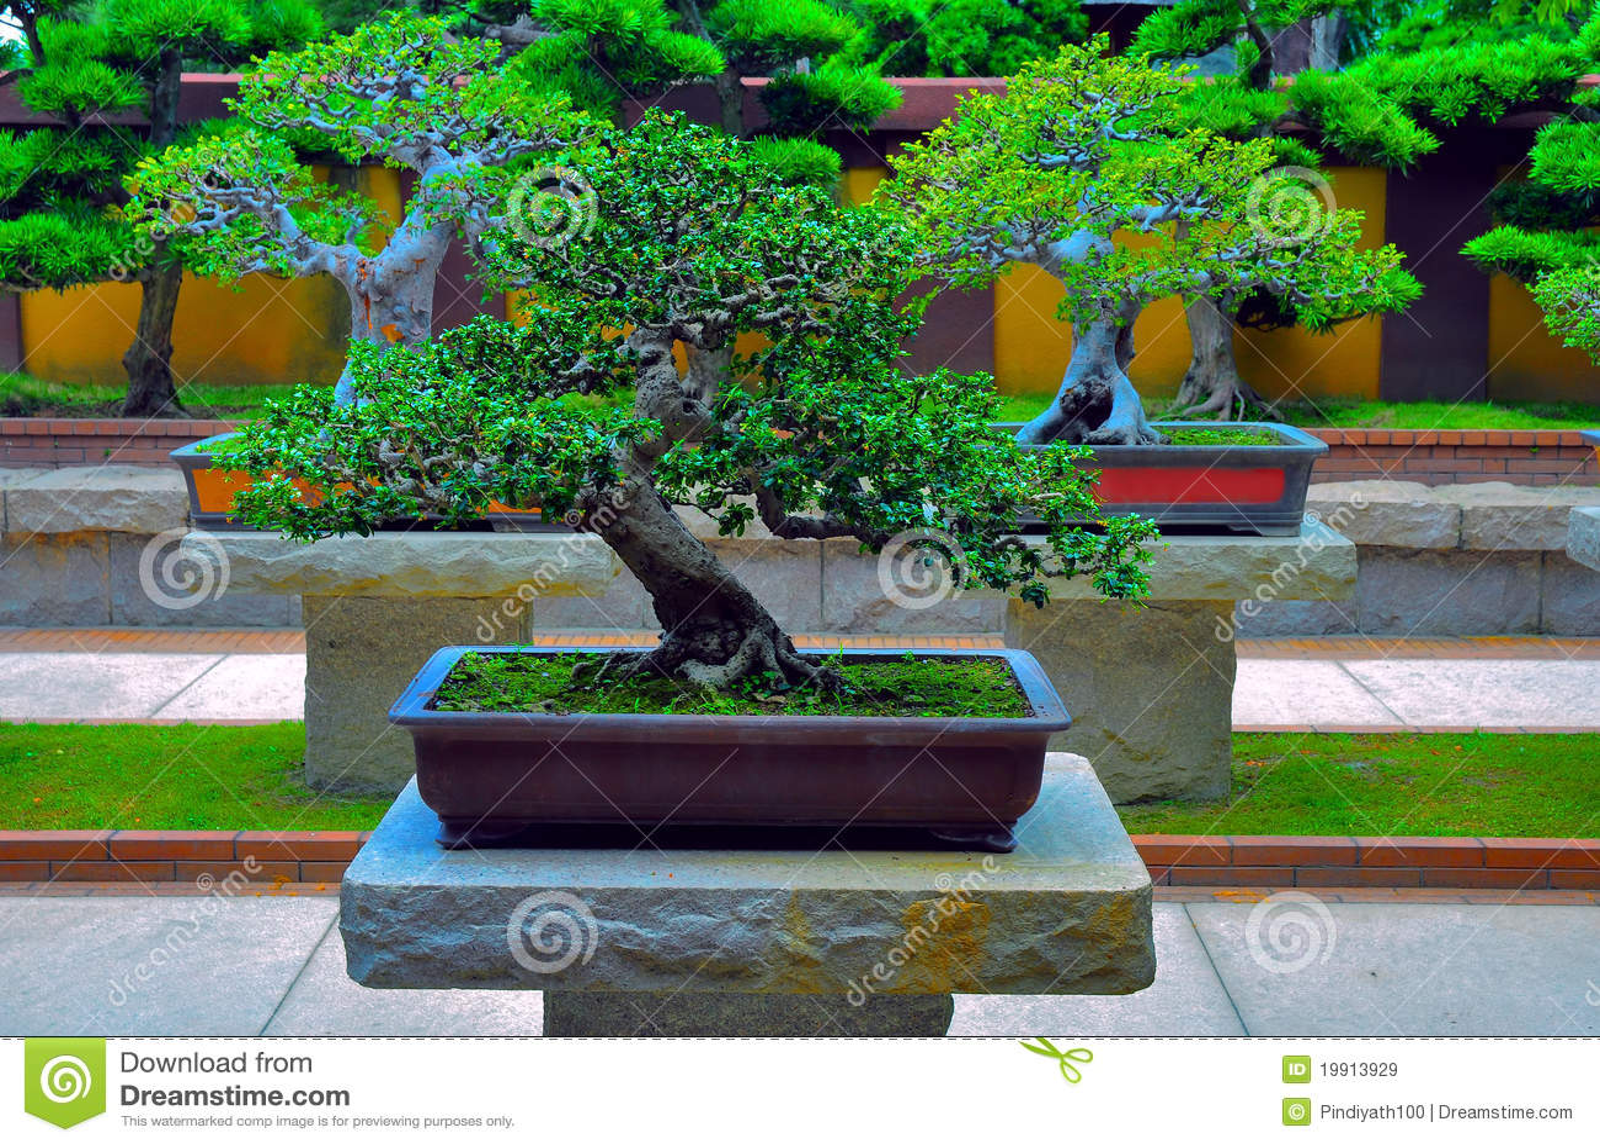 Miniature bonsai tree royalty free stock images image for Zen garden trees